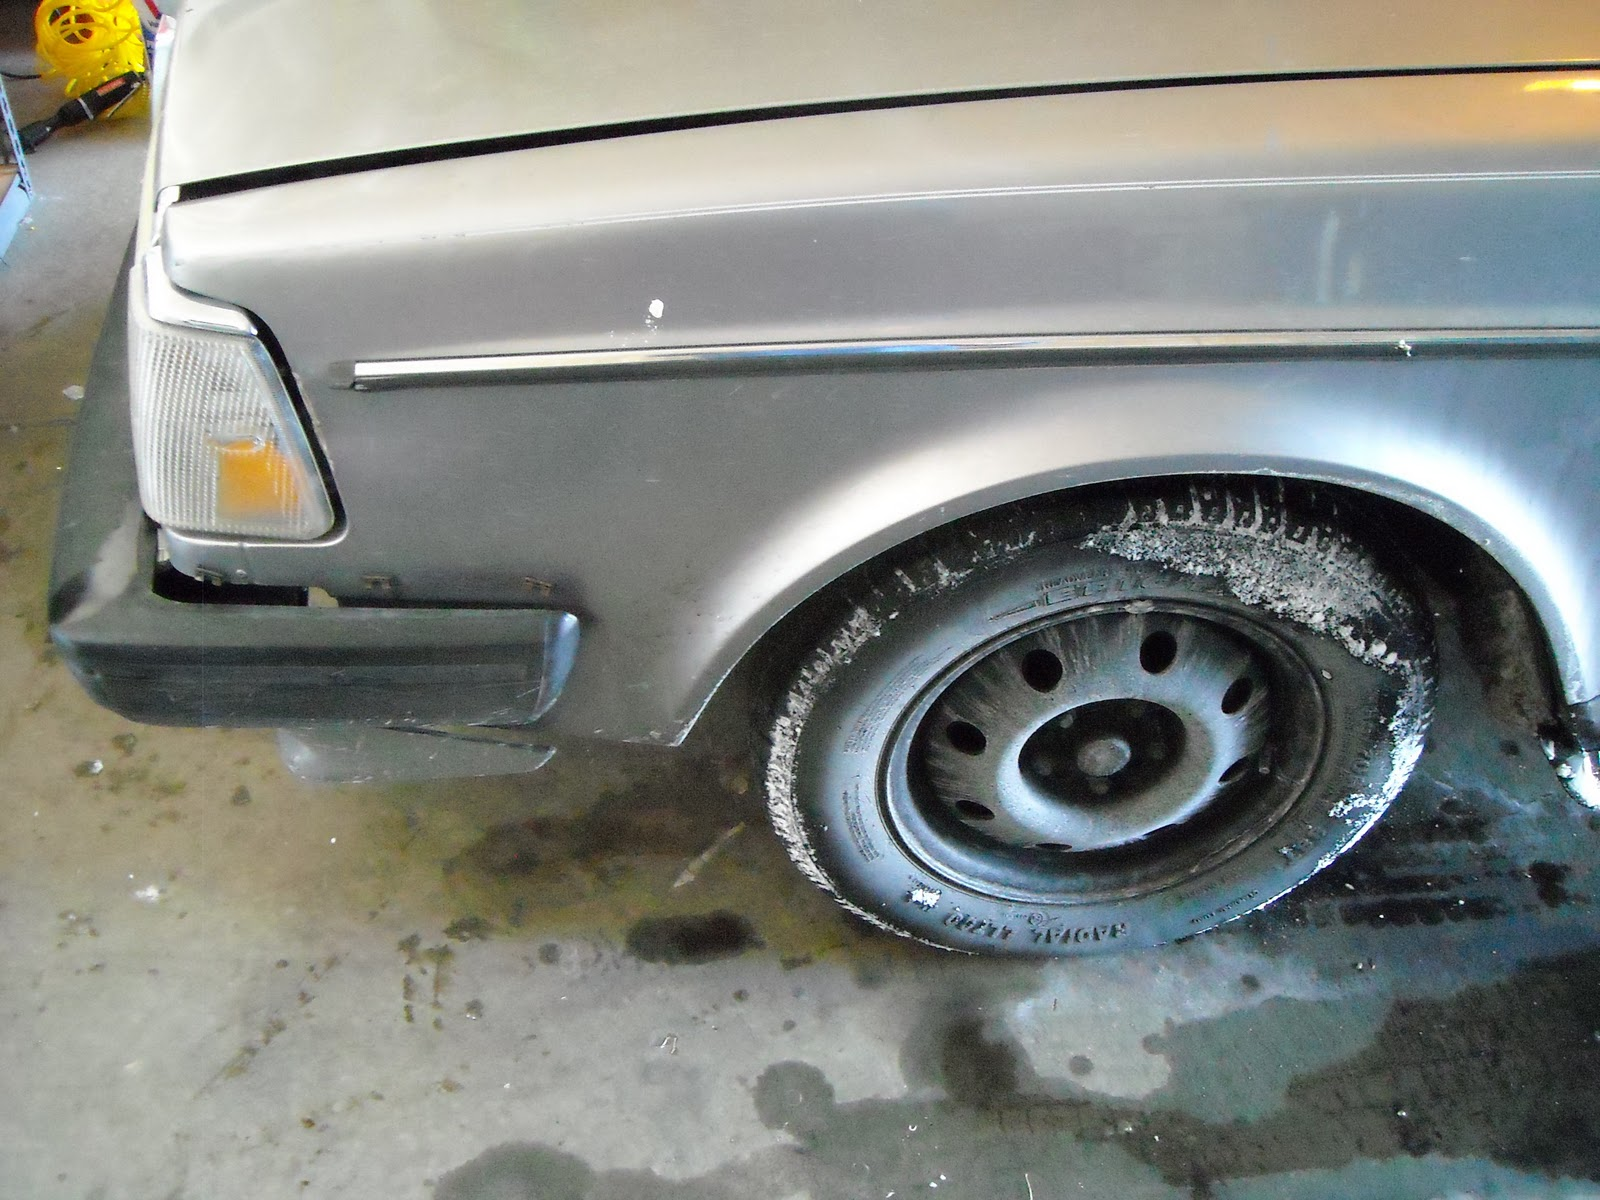 Volvo 240 Trim - Missing Bumper Trim - Volvo 240 Trim